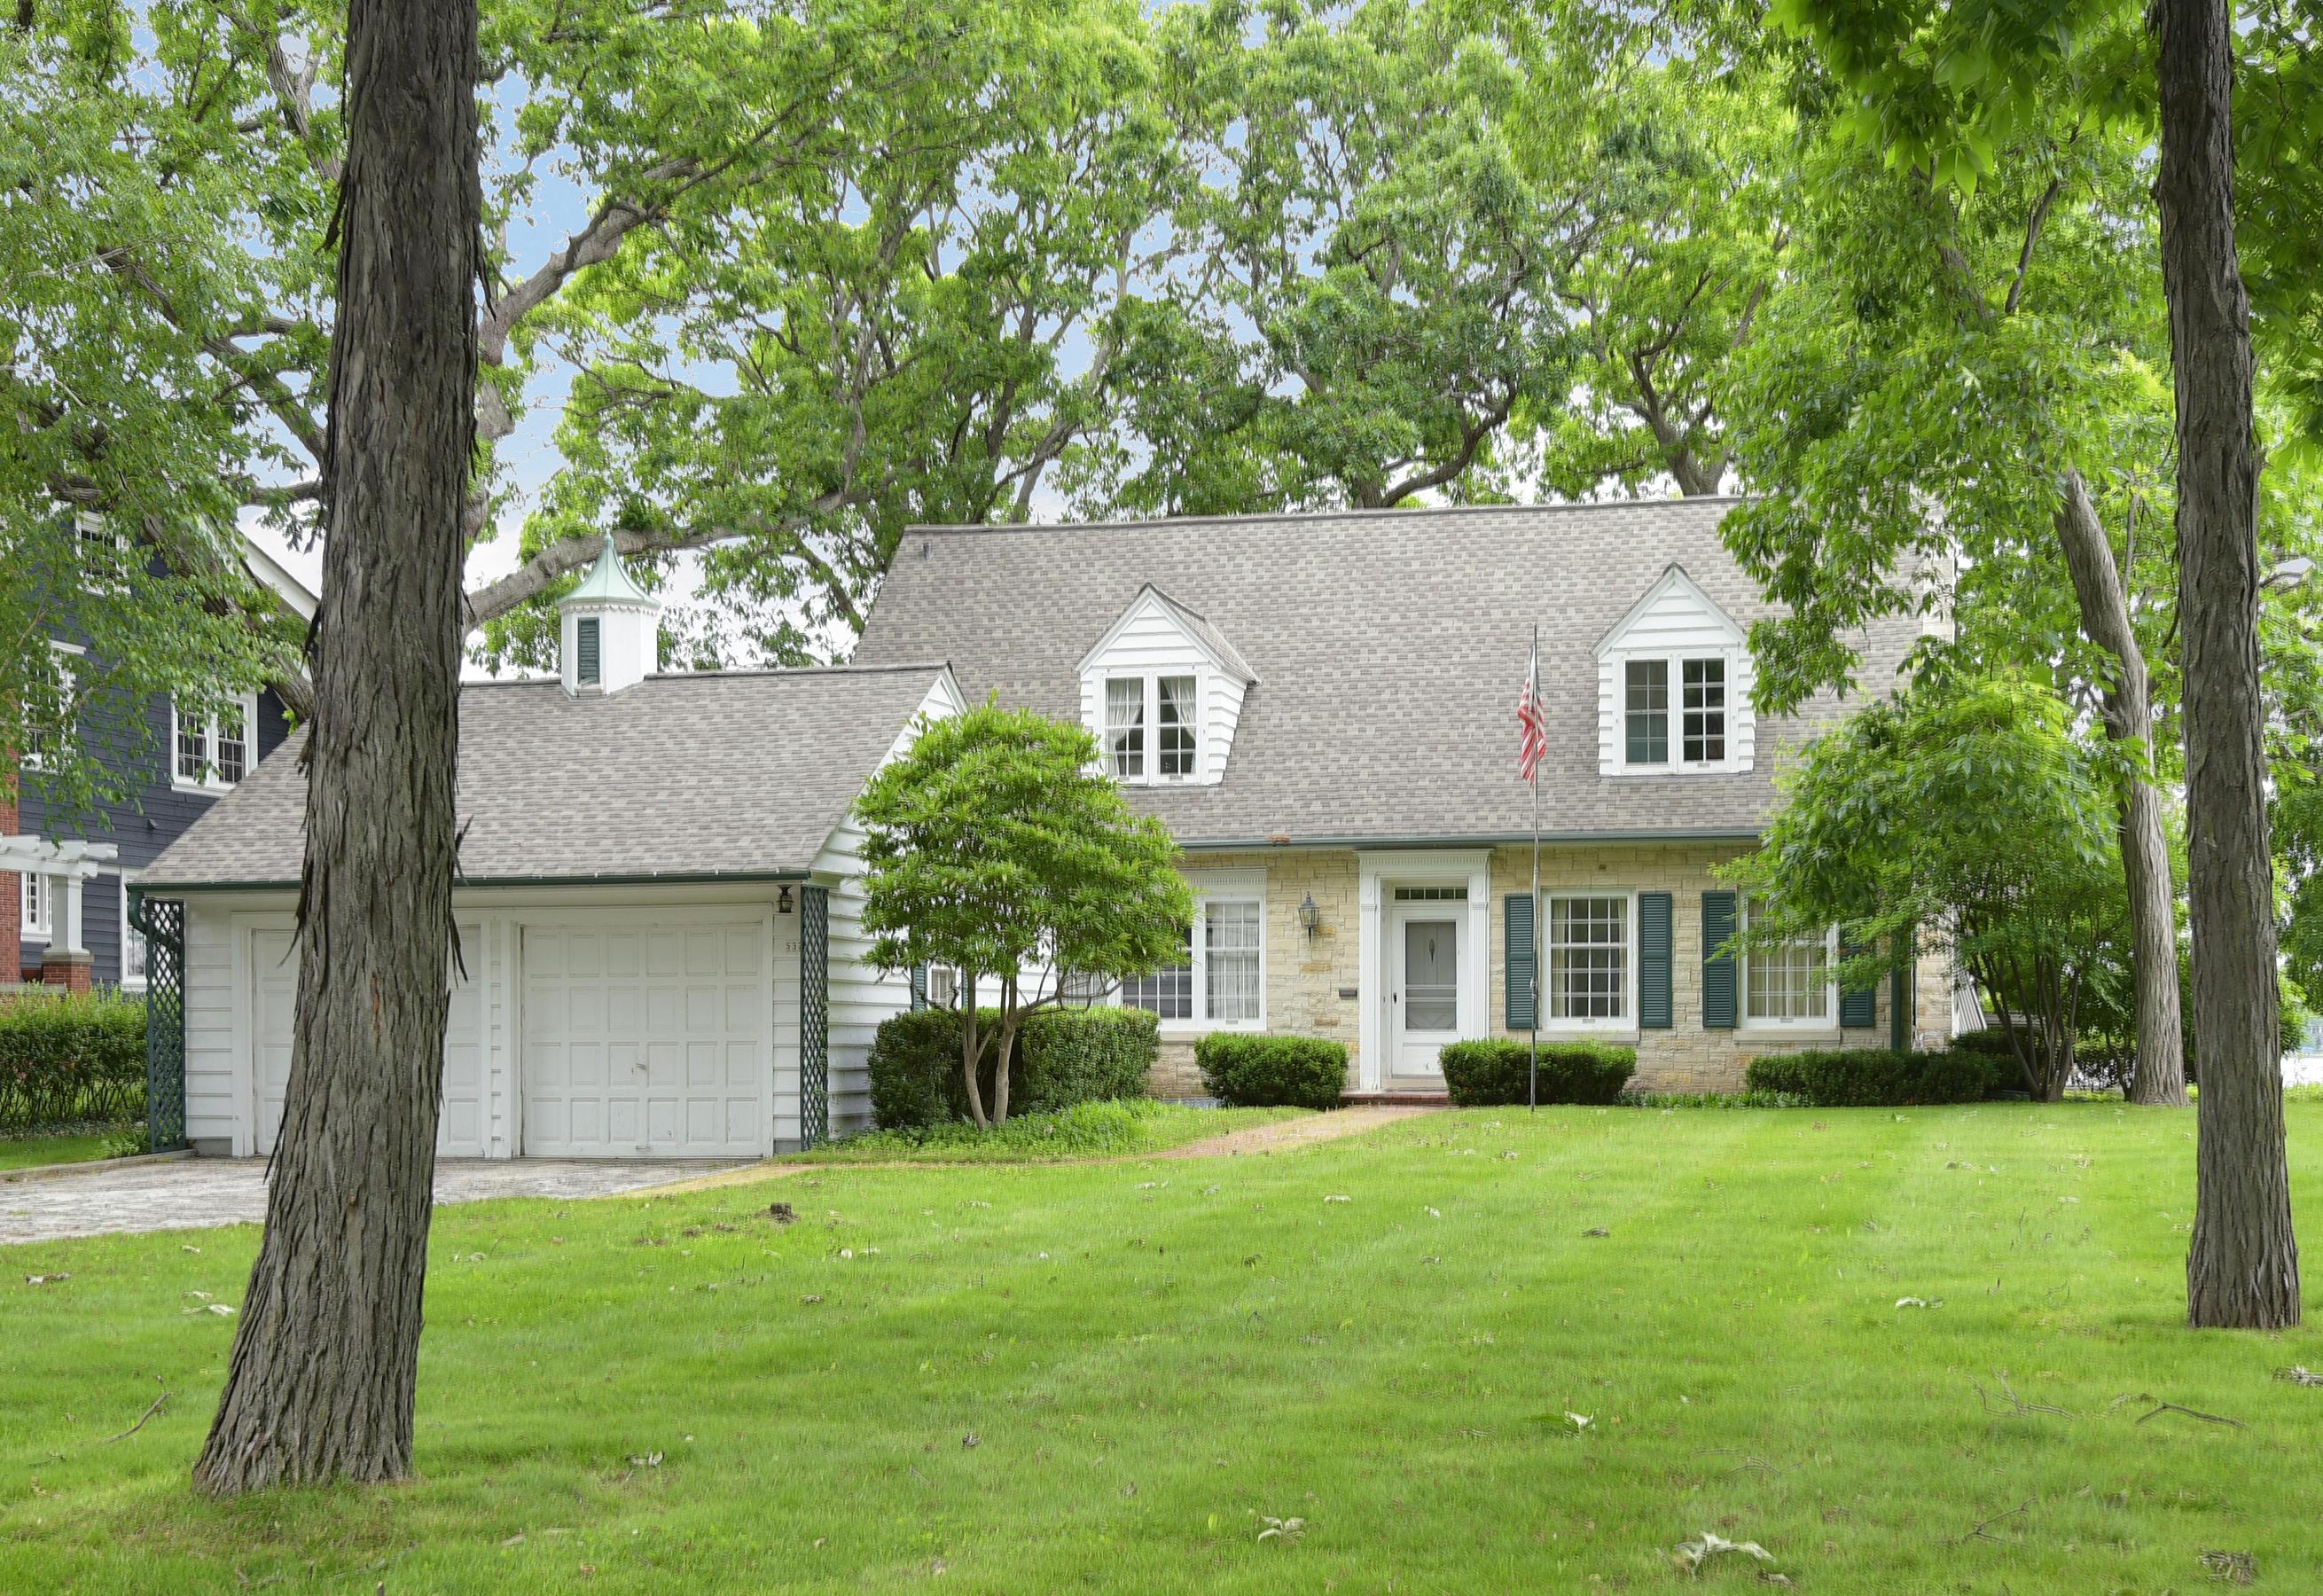 532 Glenview Ave, Oconomowoc, Wisconsin 53066, 4 Bedrooms Bedrooms, 9 Rooms Rooms,2 BathroomsBathrooms,Single-Family,For Sale,Glenview Ave,1643692